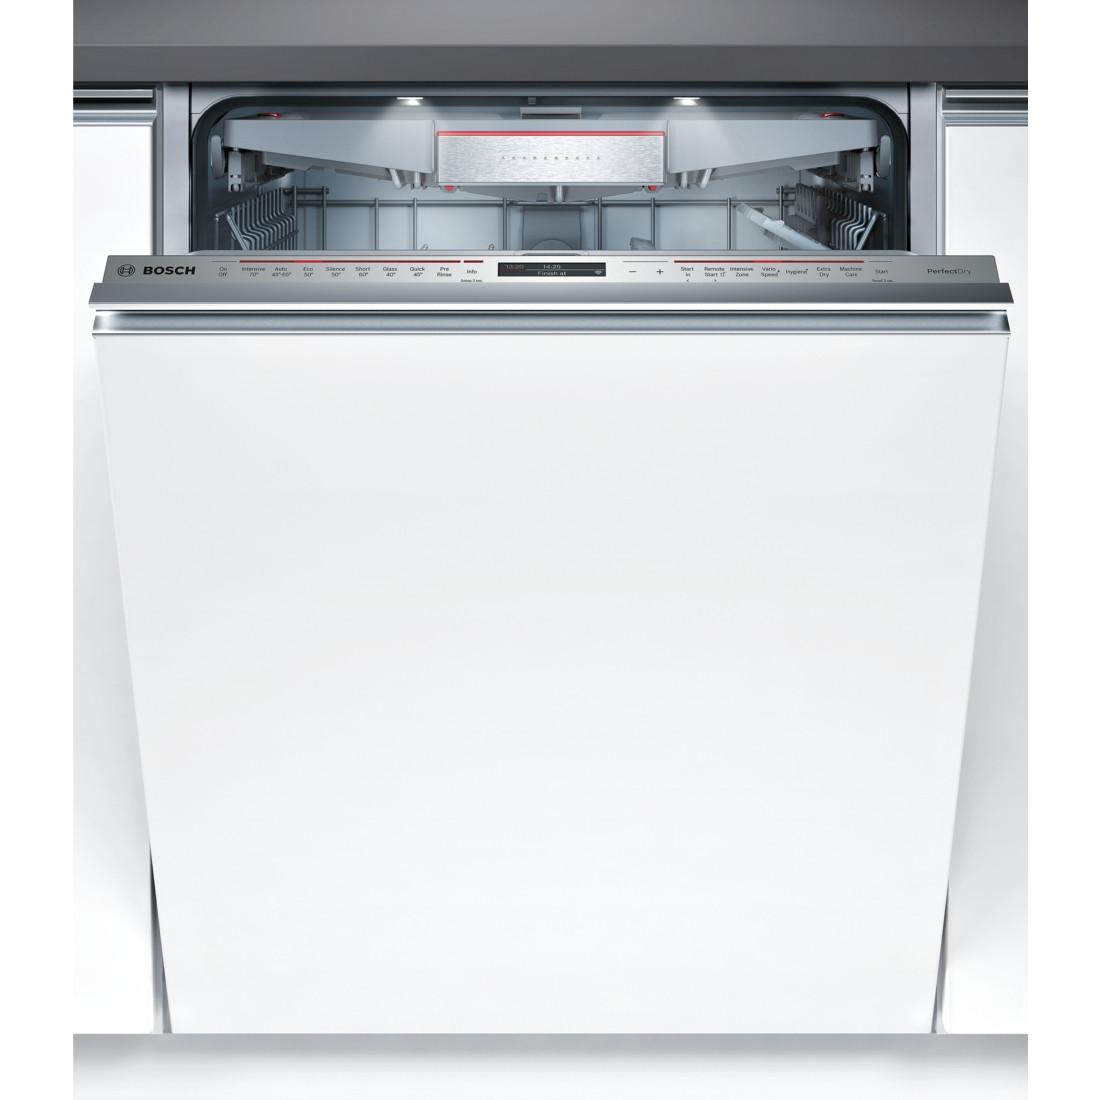 Bosch SMV68TD06G 60 Fully Integrated Dishwasher